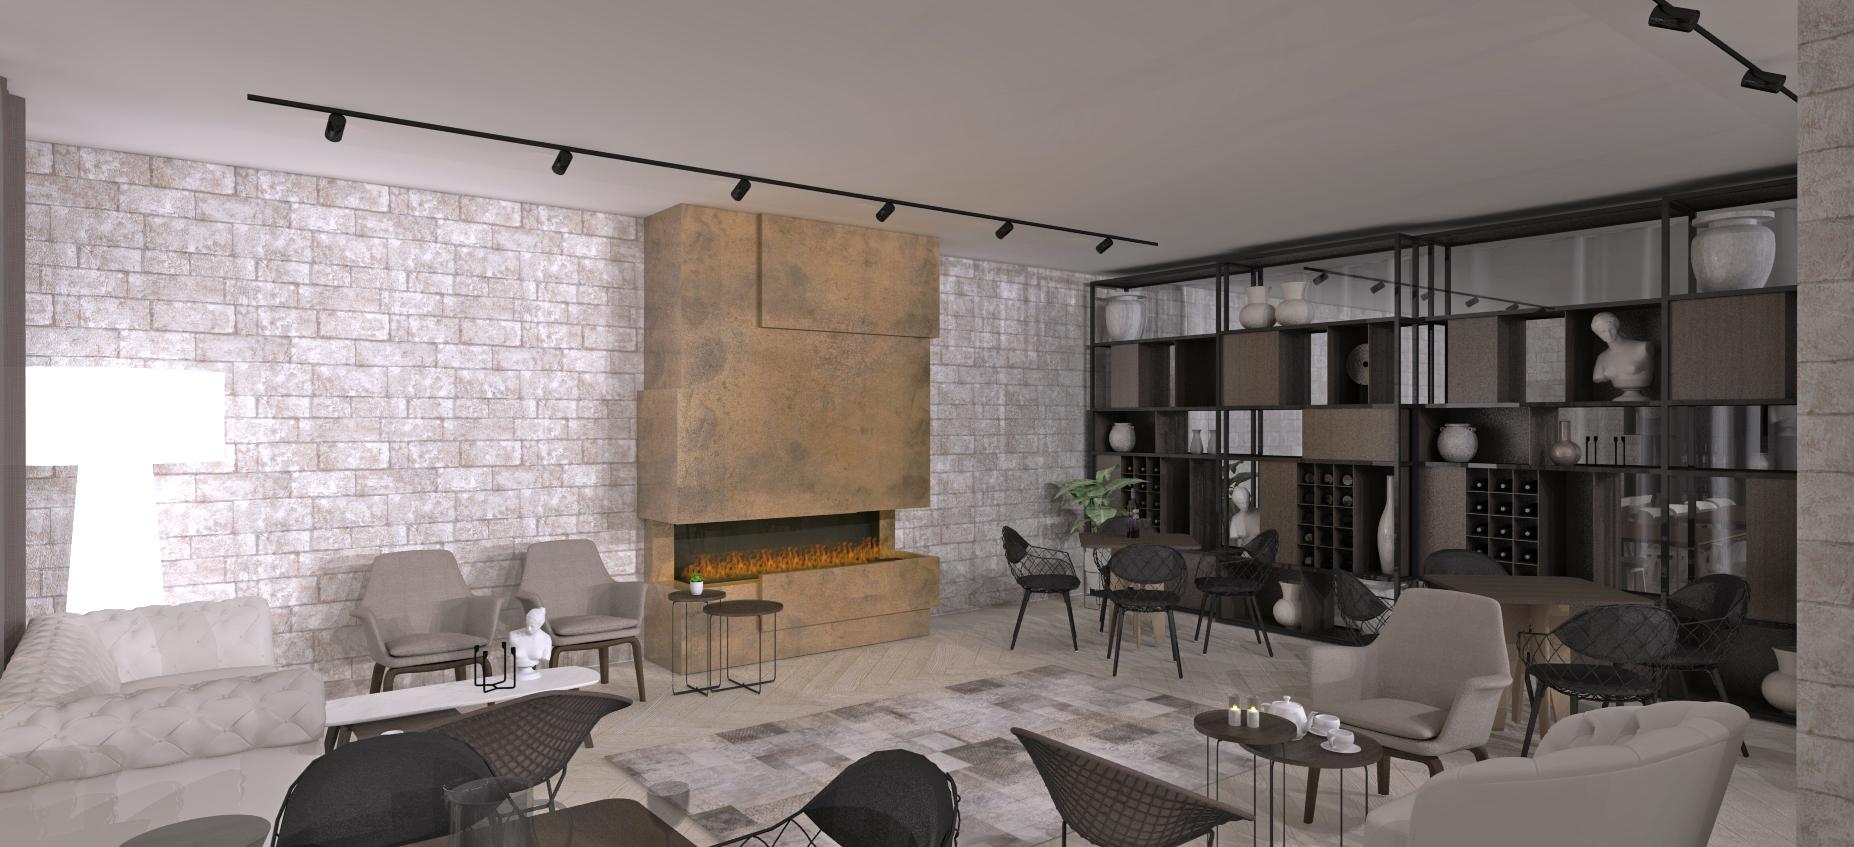 Probus lounge 2